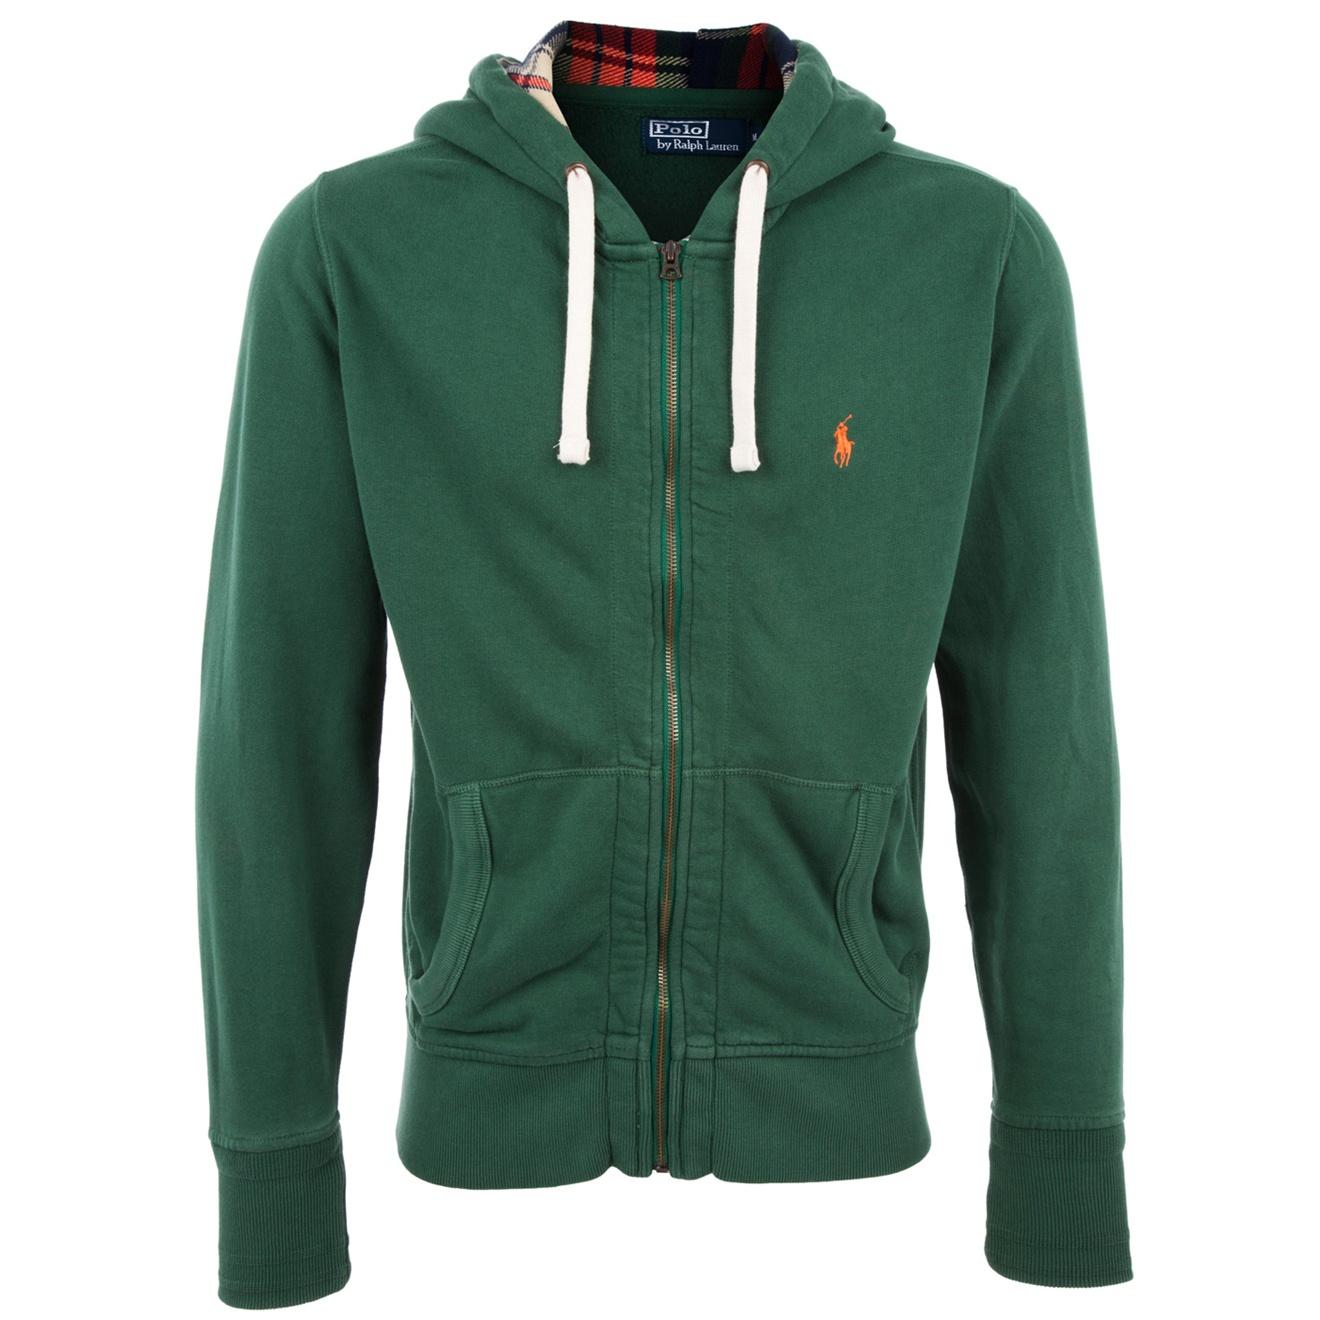 polo ralph lauren zip through hoodie in green for men lyst. Black Bedroom Furniture Sets. Home Design Ideas